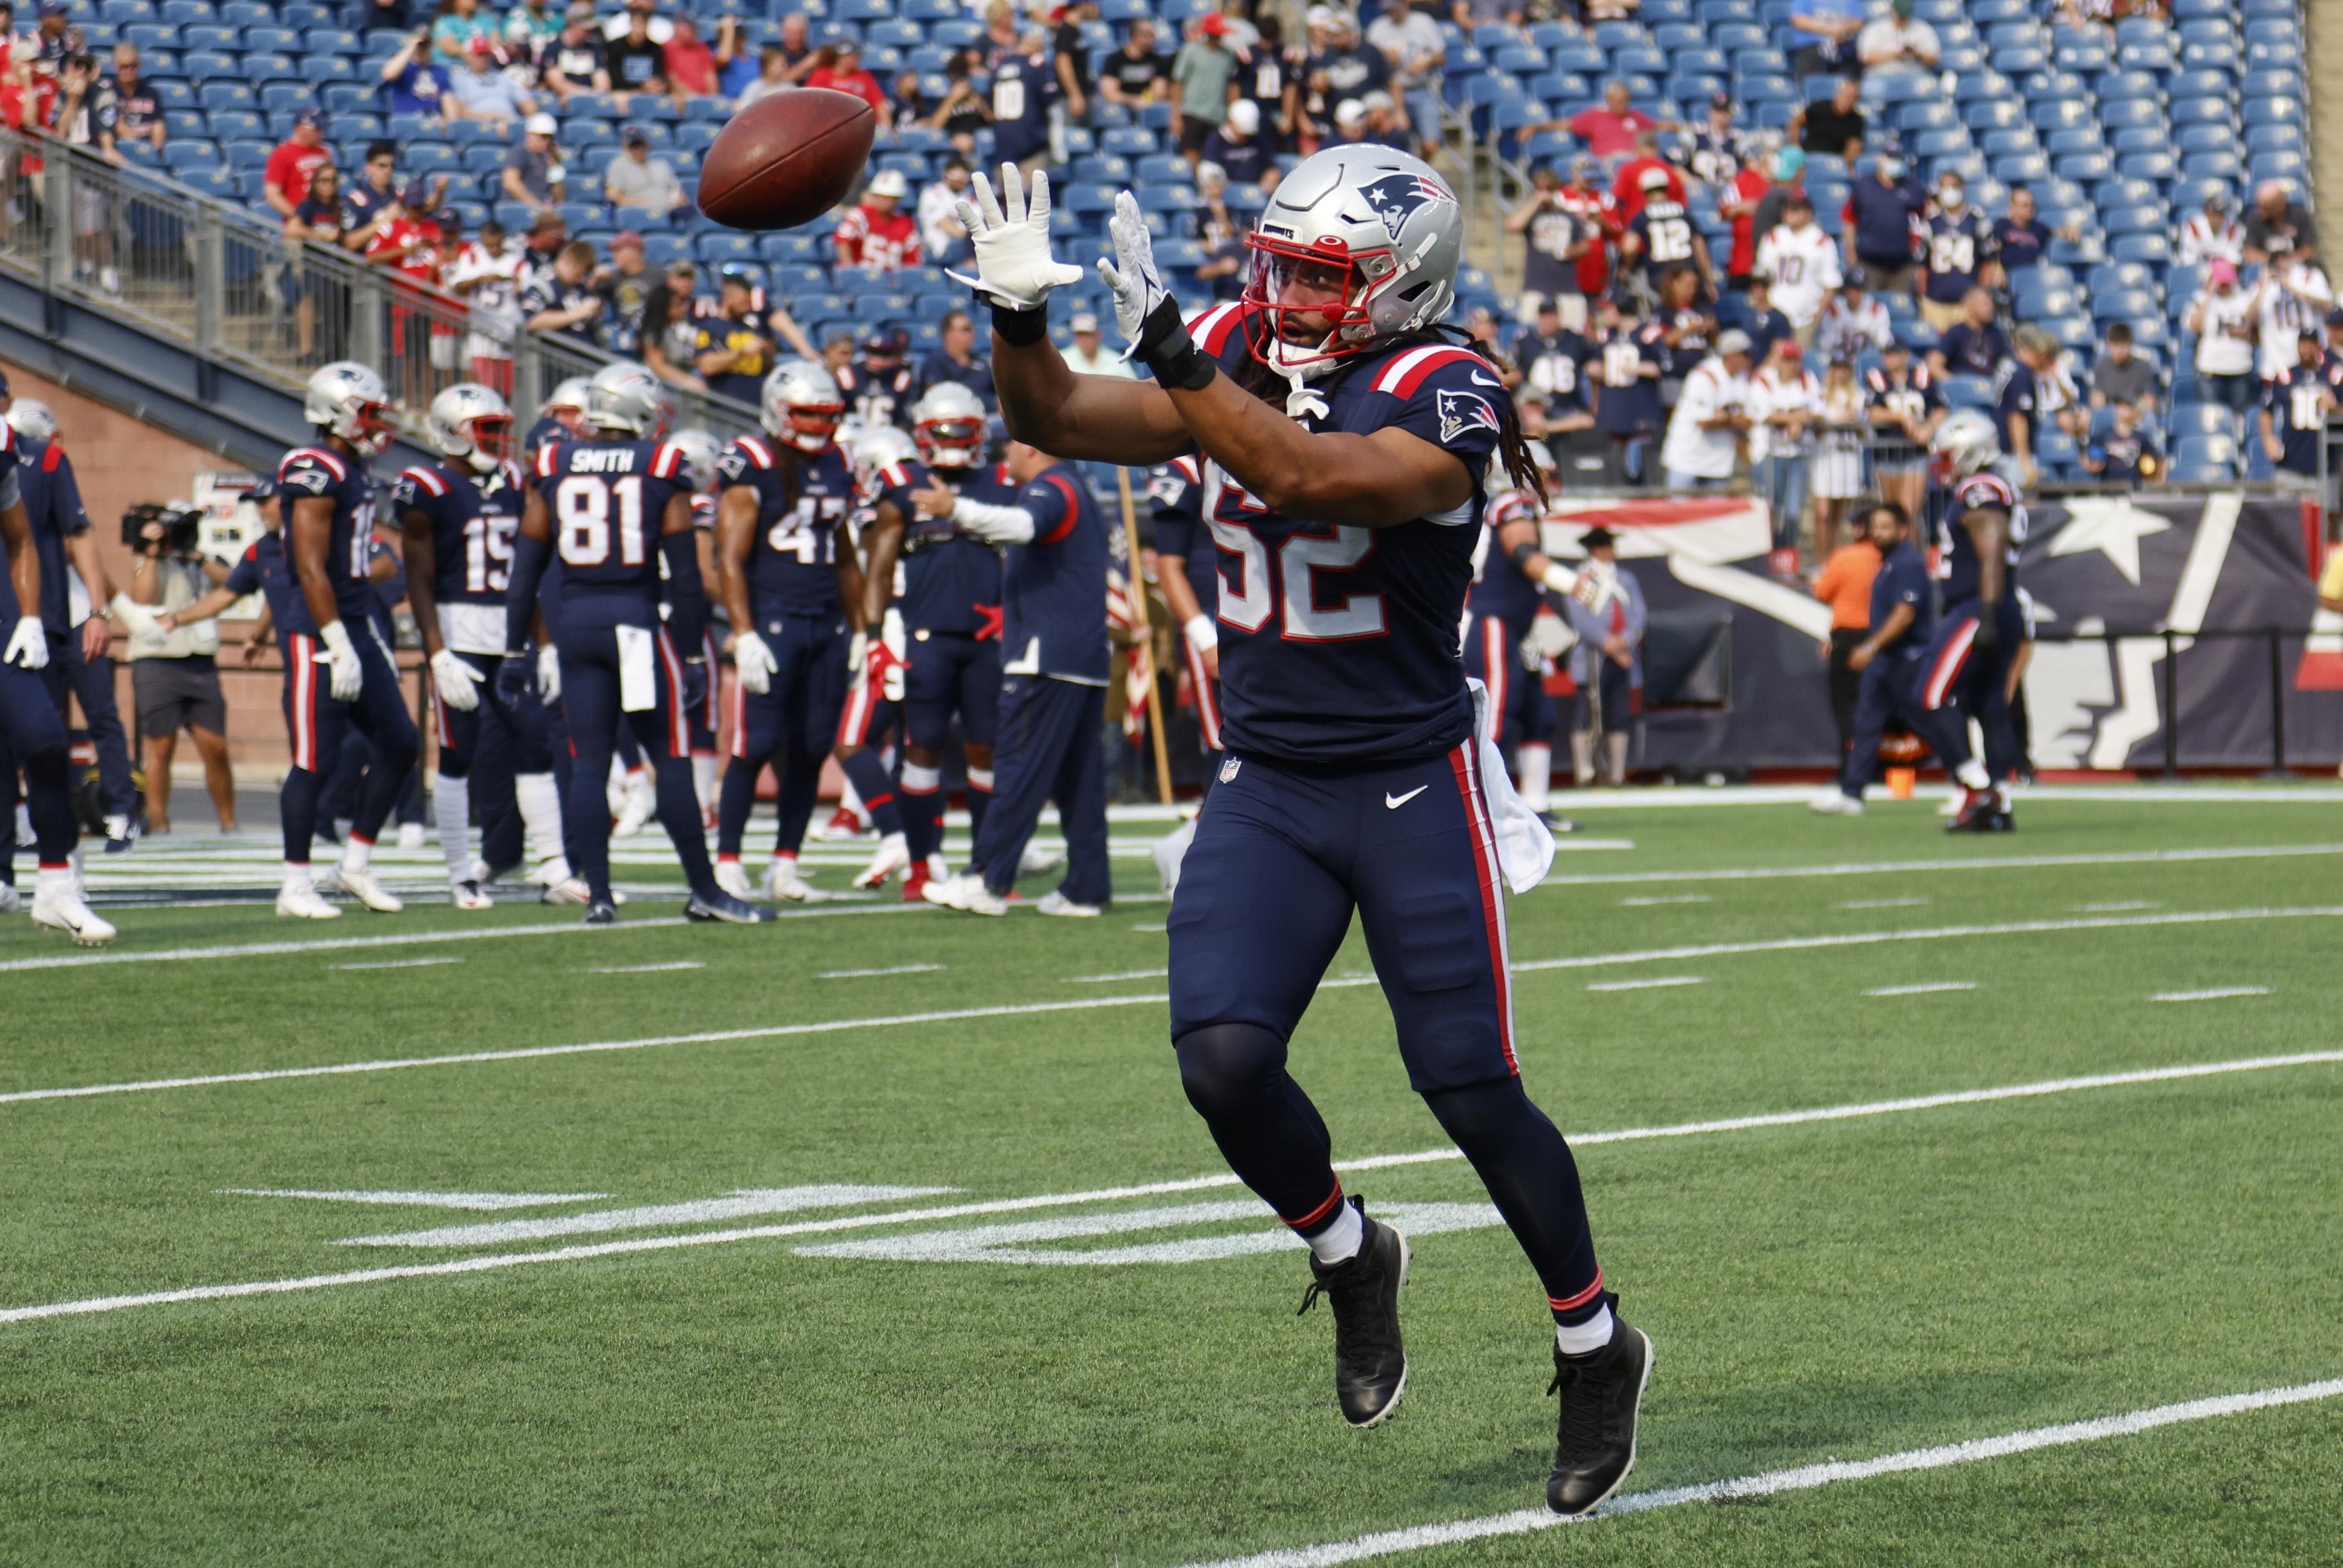 NFL: SEP 12 Dolphins at Patriots